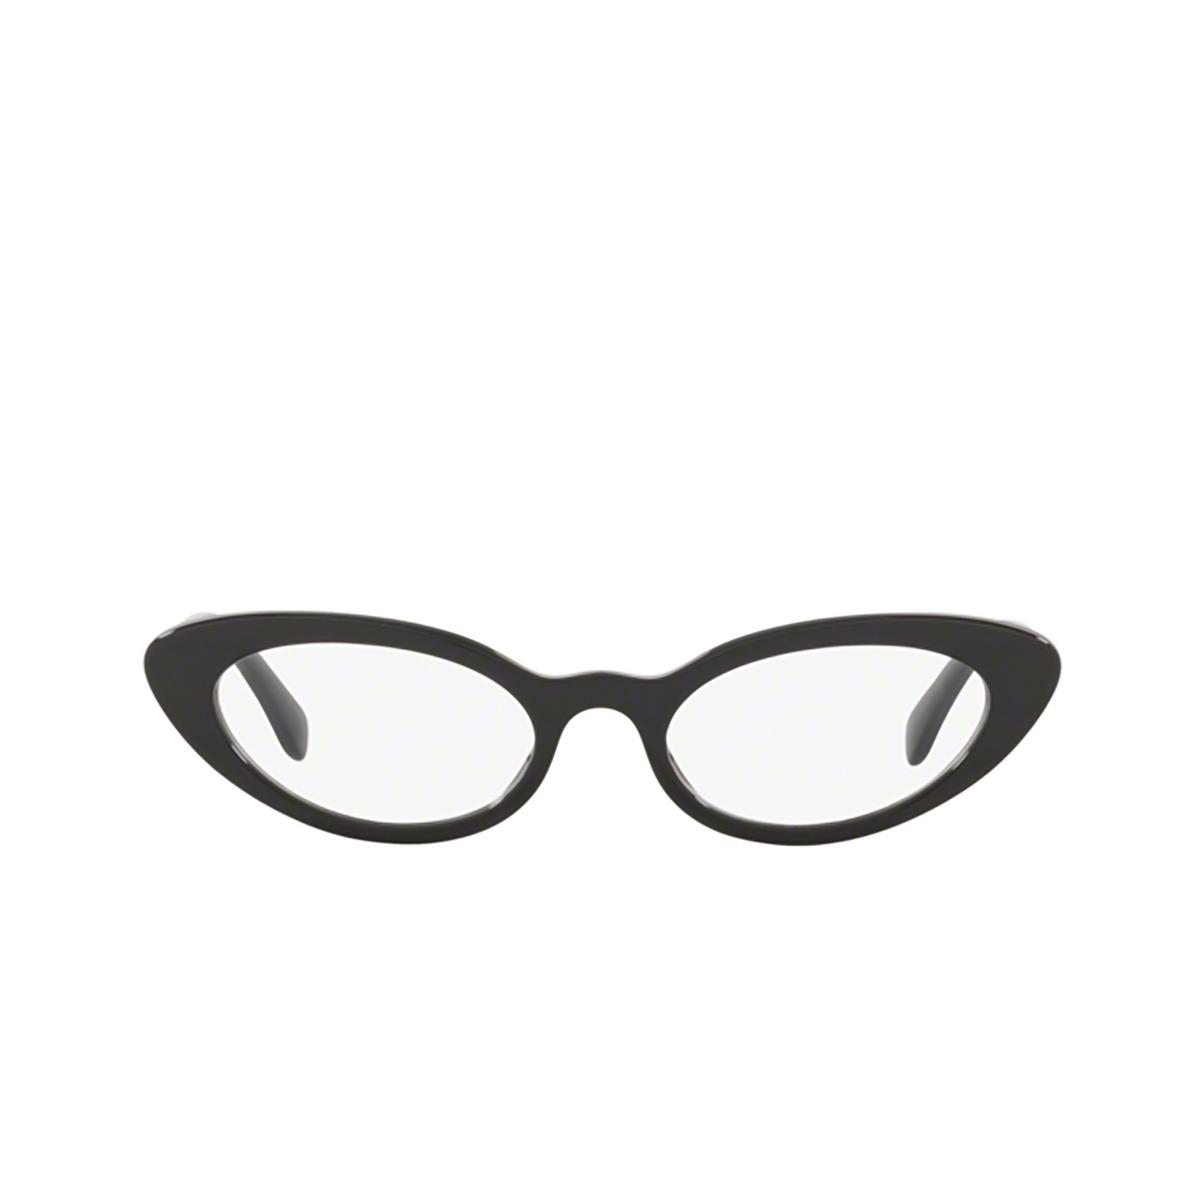 Miu Miu® Cat-eye Eyeglasses: MU 01SV color Black 1AB1O1 - front view.